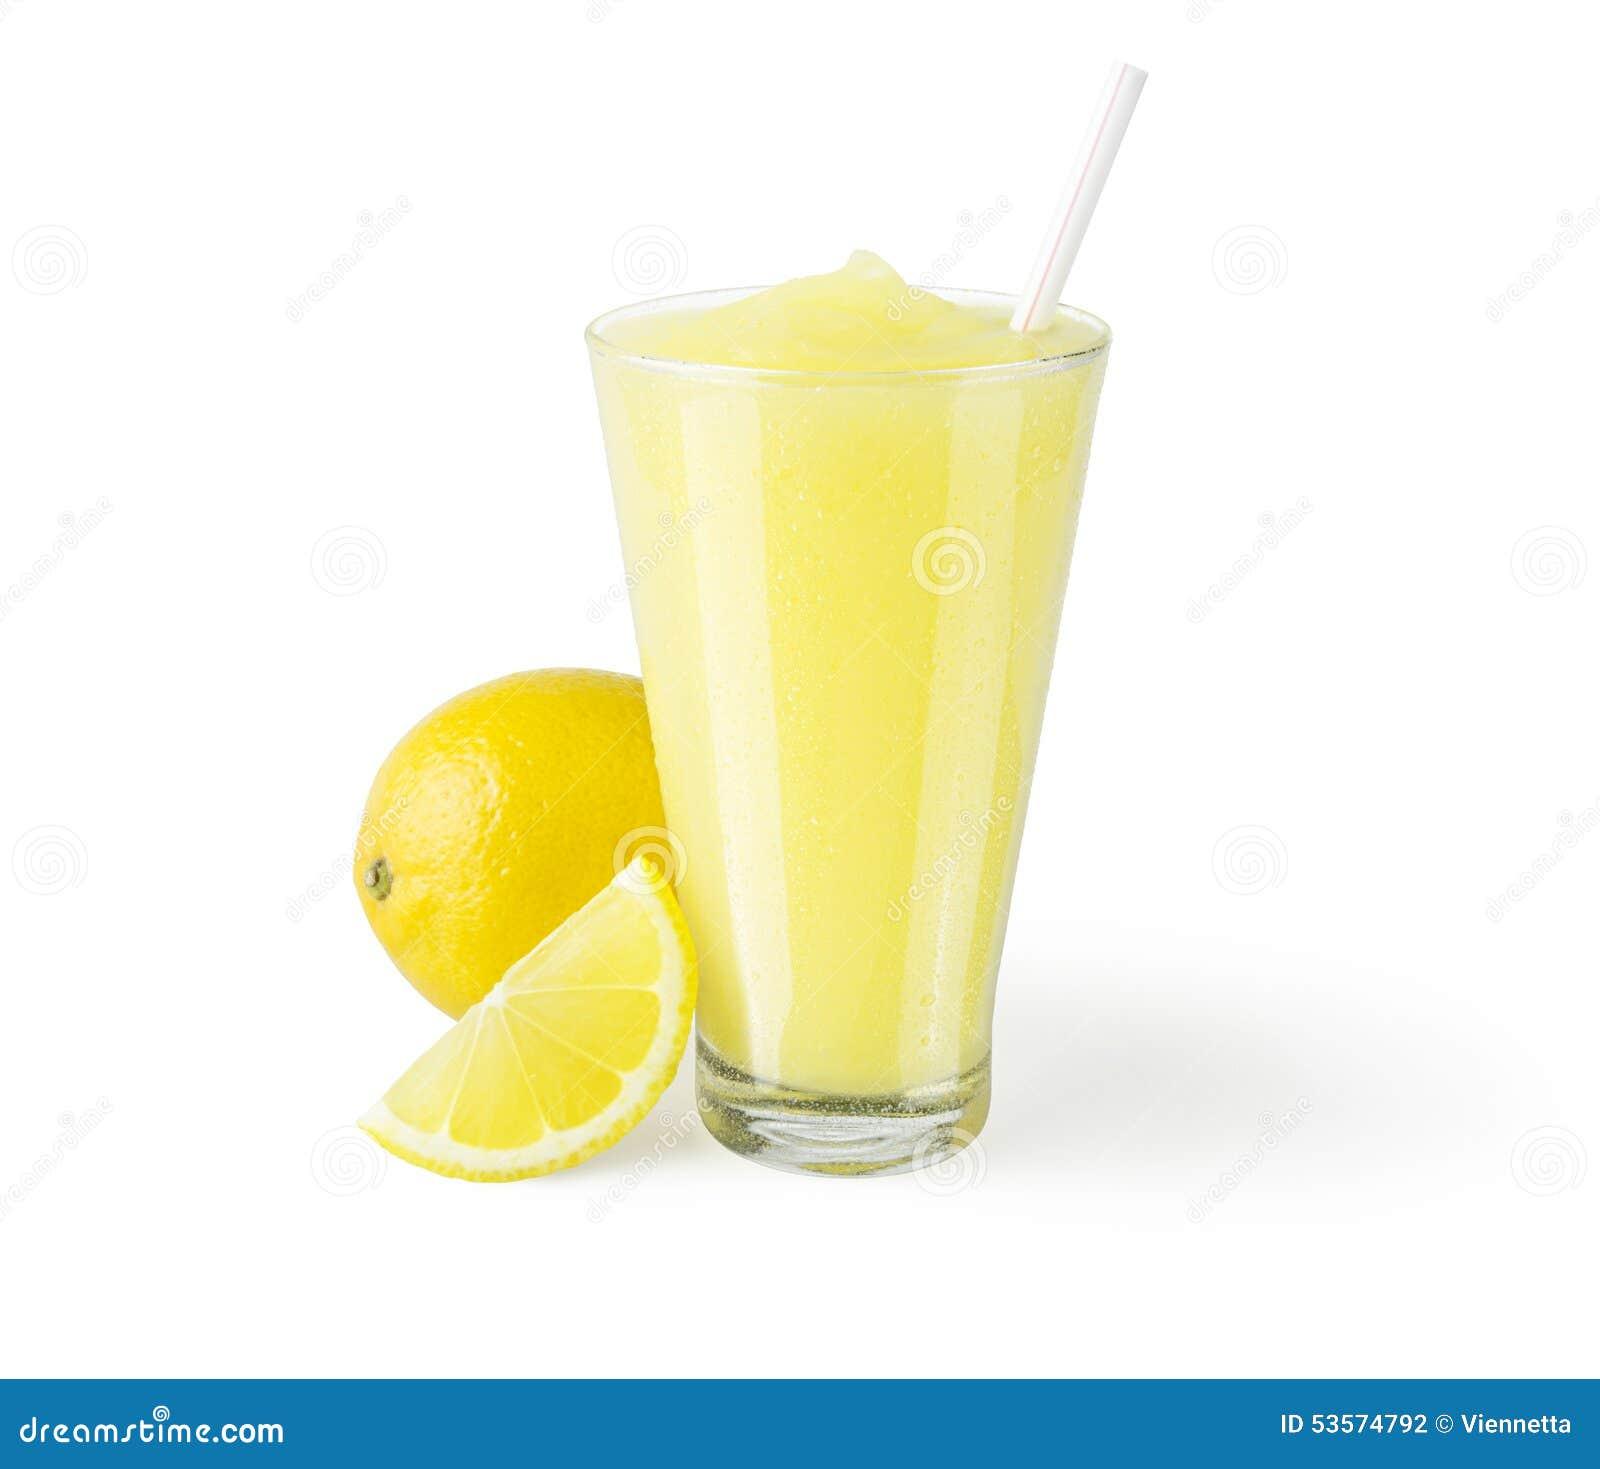 lemonade clipart black and white - photo #47